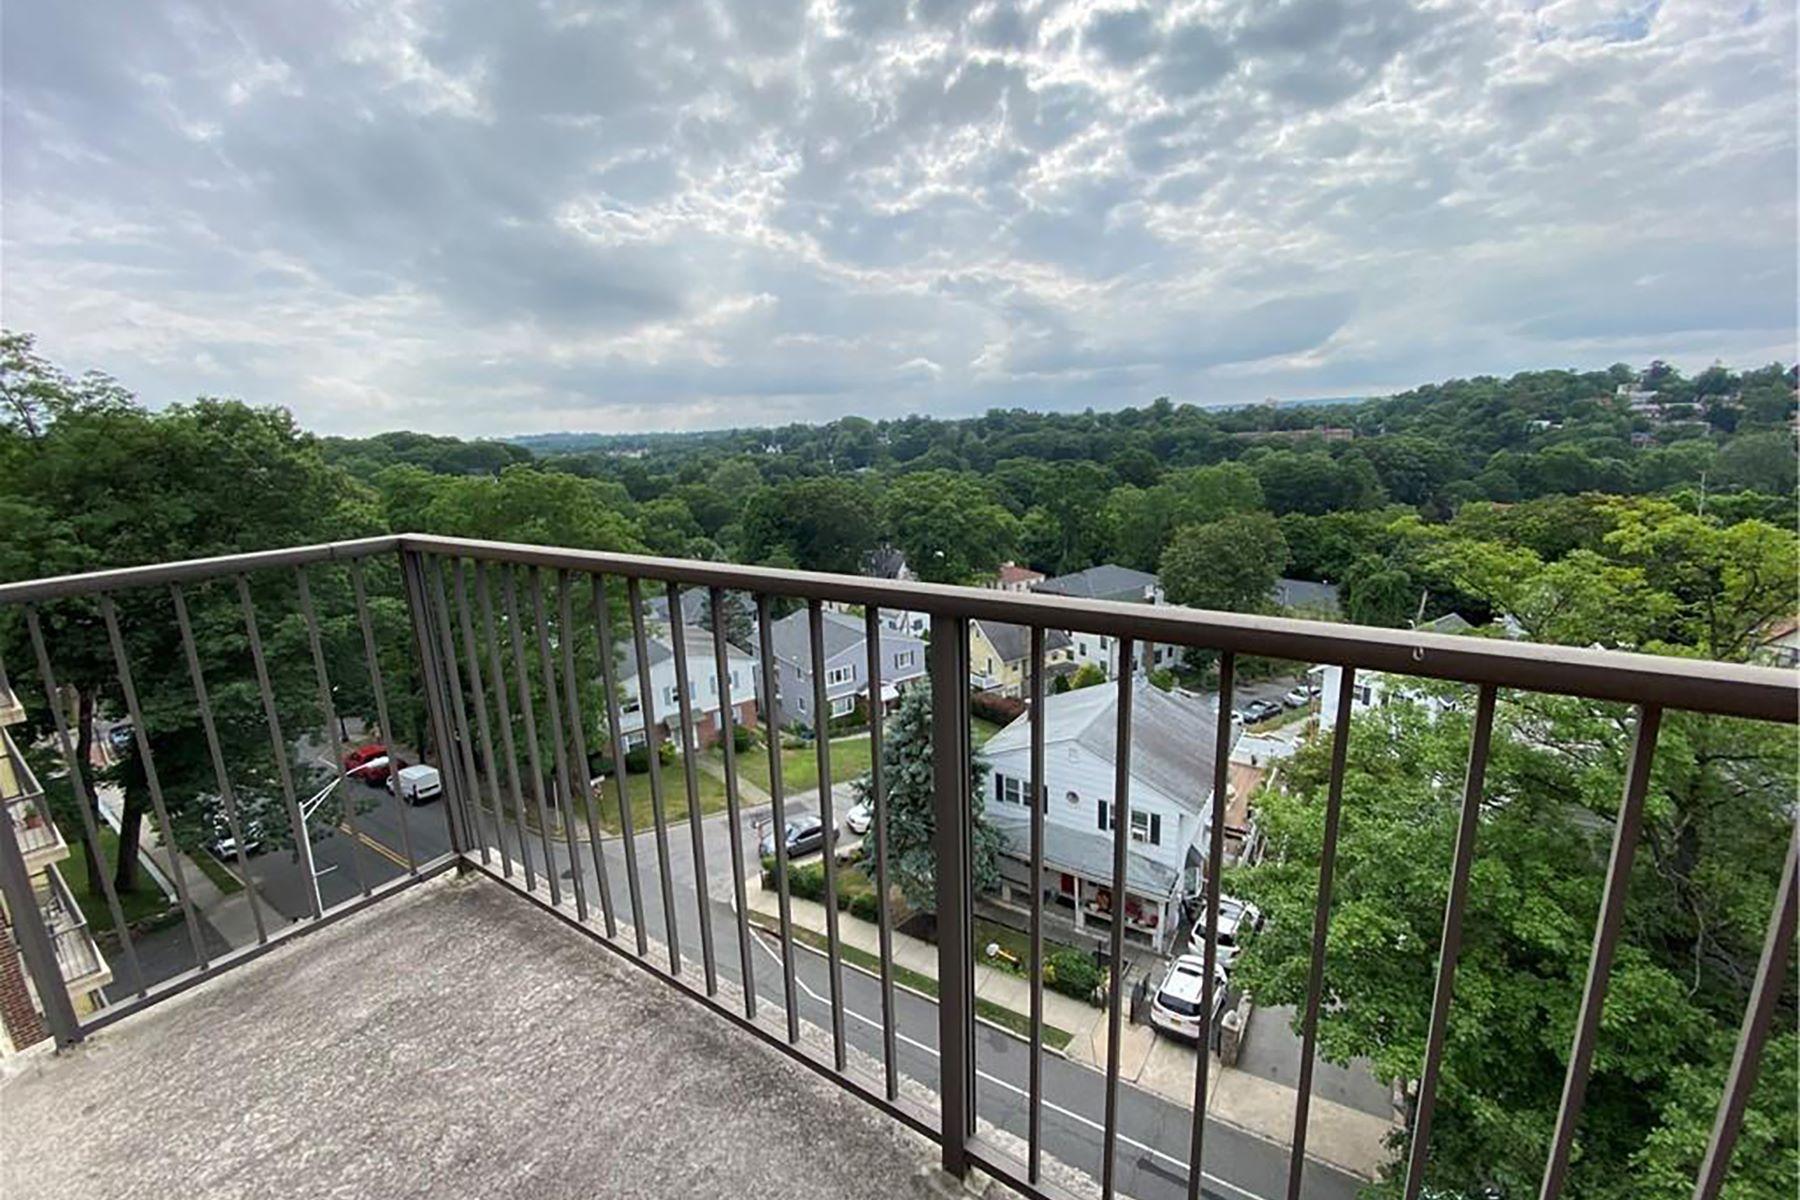 Co-op Properties for Sale at Top Floor Unit Overlooking Quaint Village of Tuckahoe 108 Sagamore Road, 6L Tuckahoe, New York 10707 United States